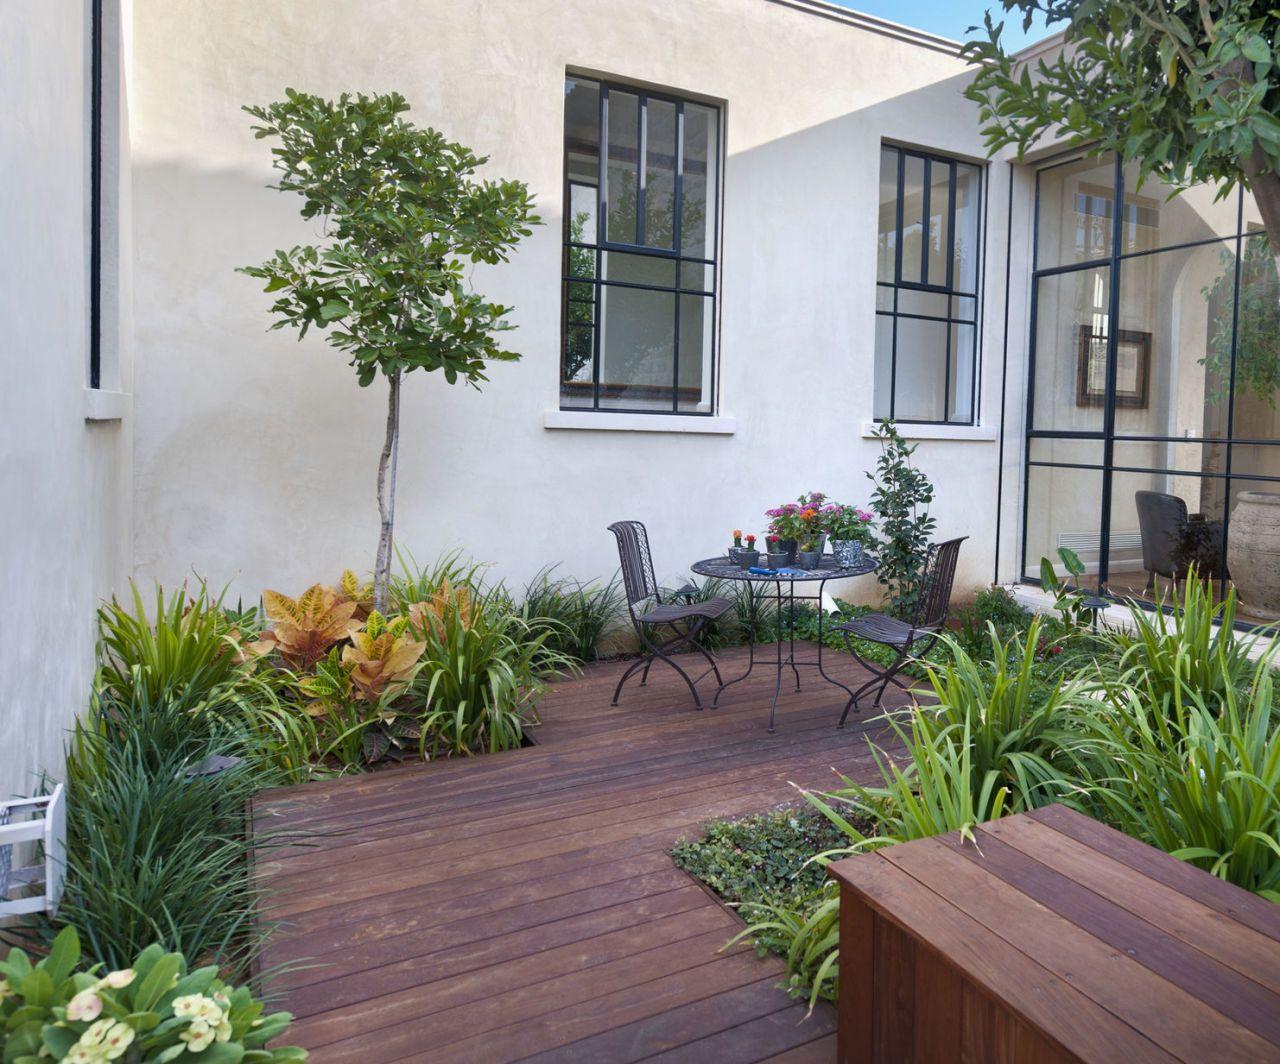 Luxury Patio In Courtyard Garden